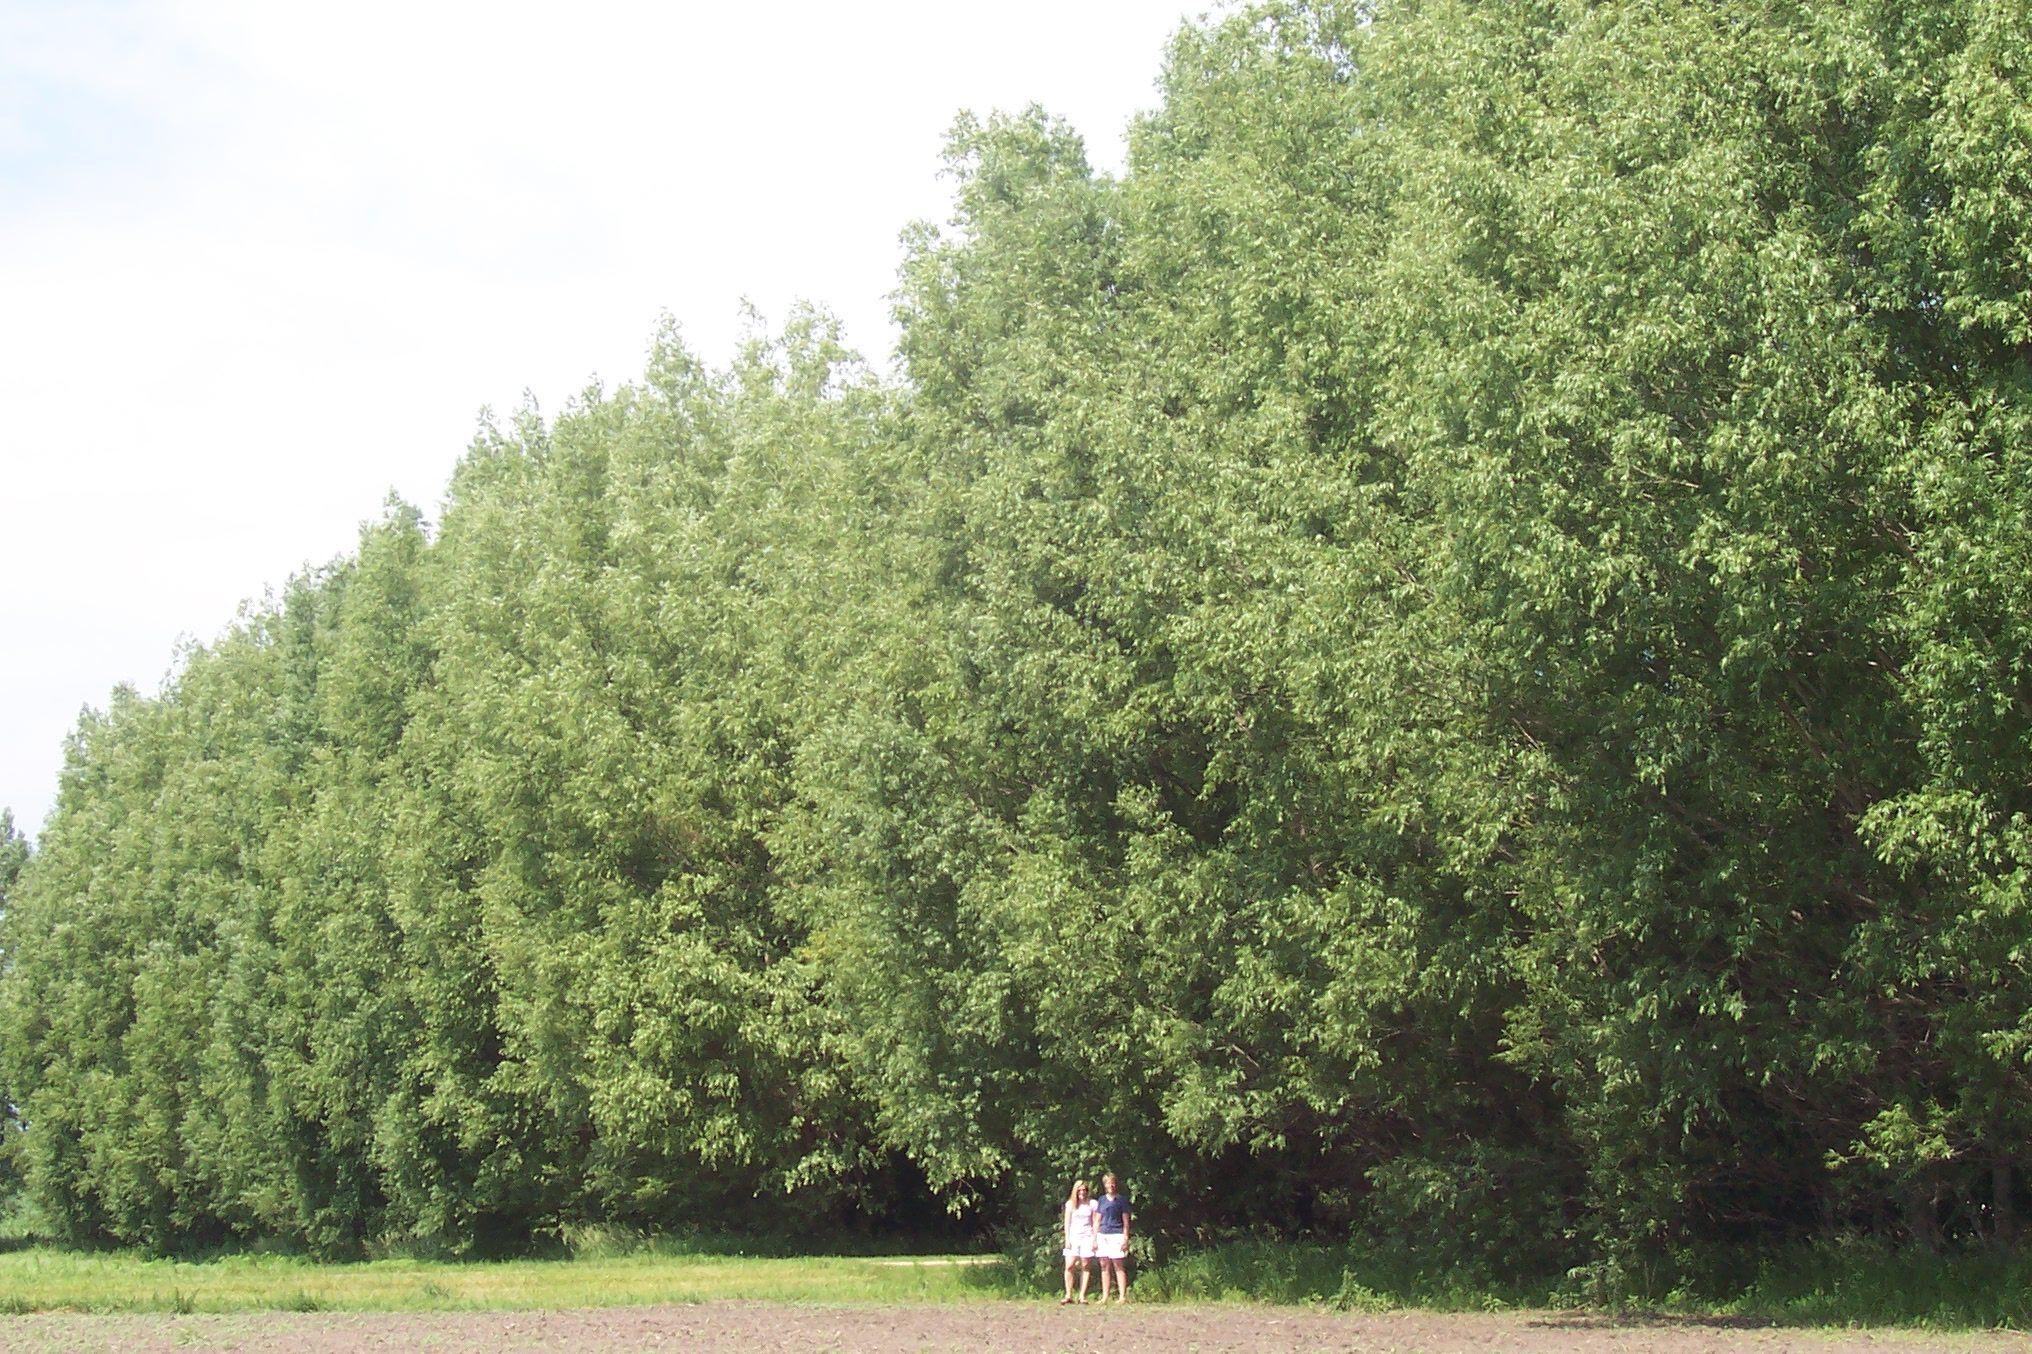 Hybrid Willow Tree Farm